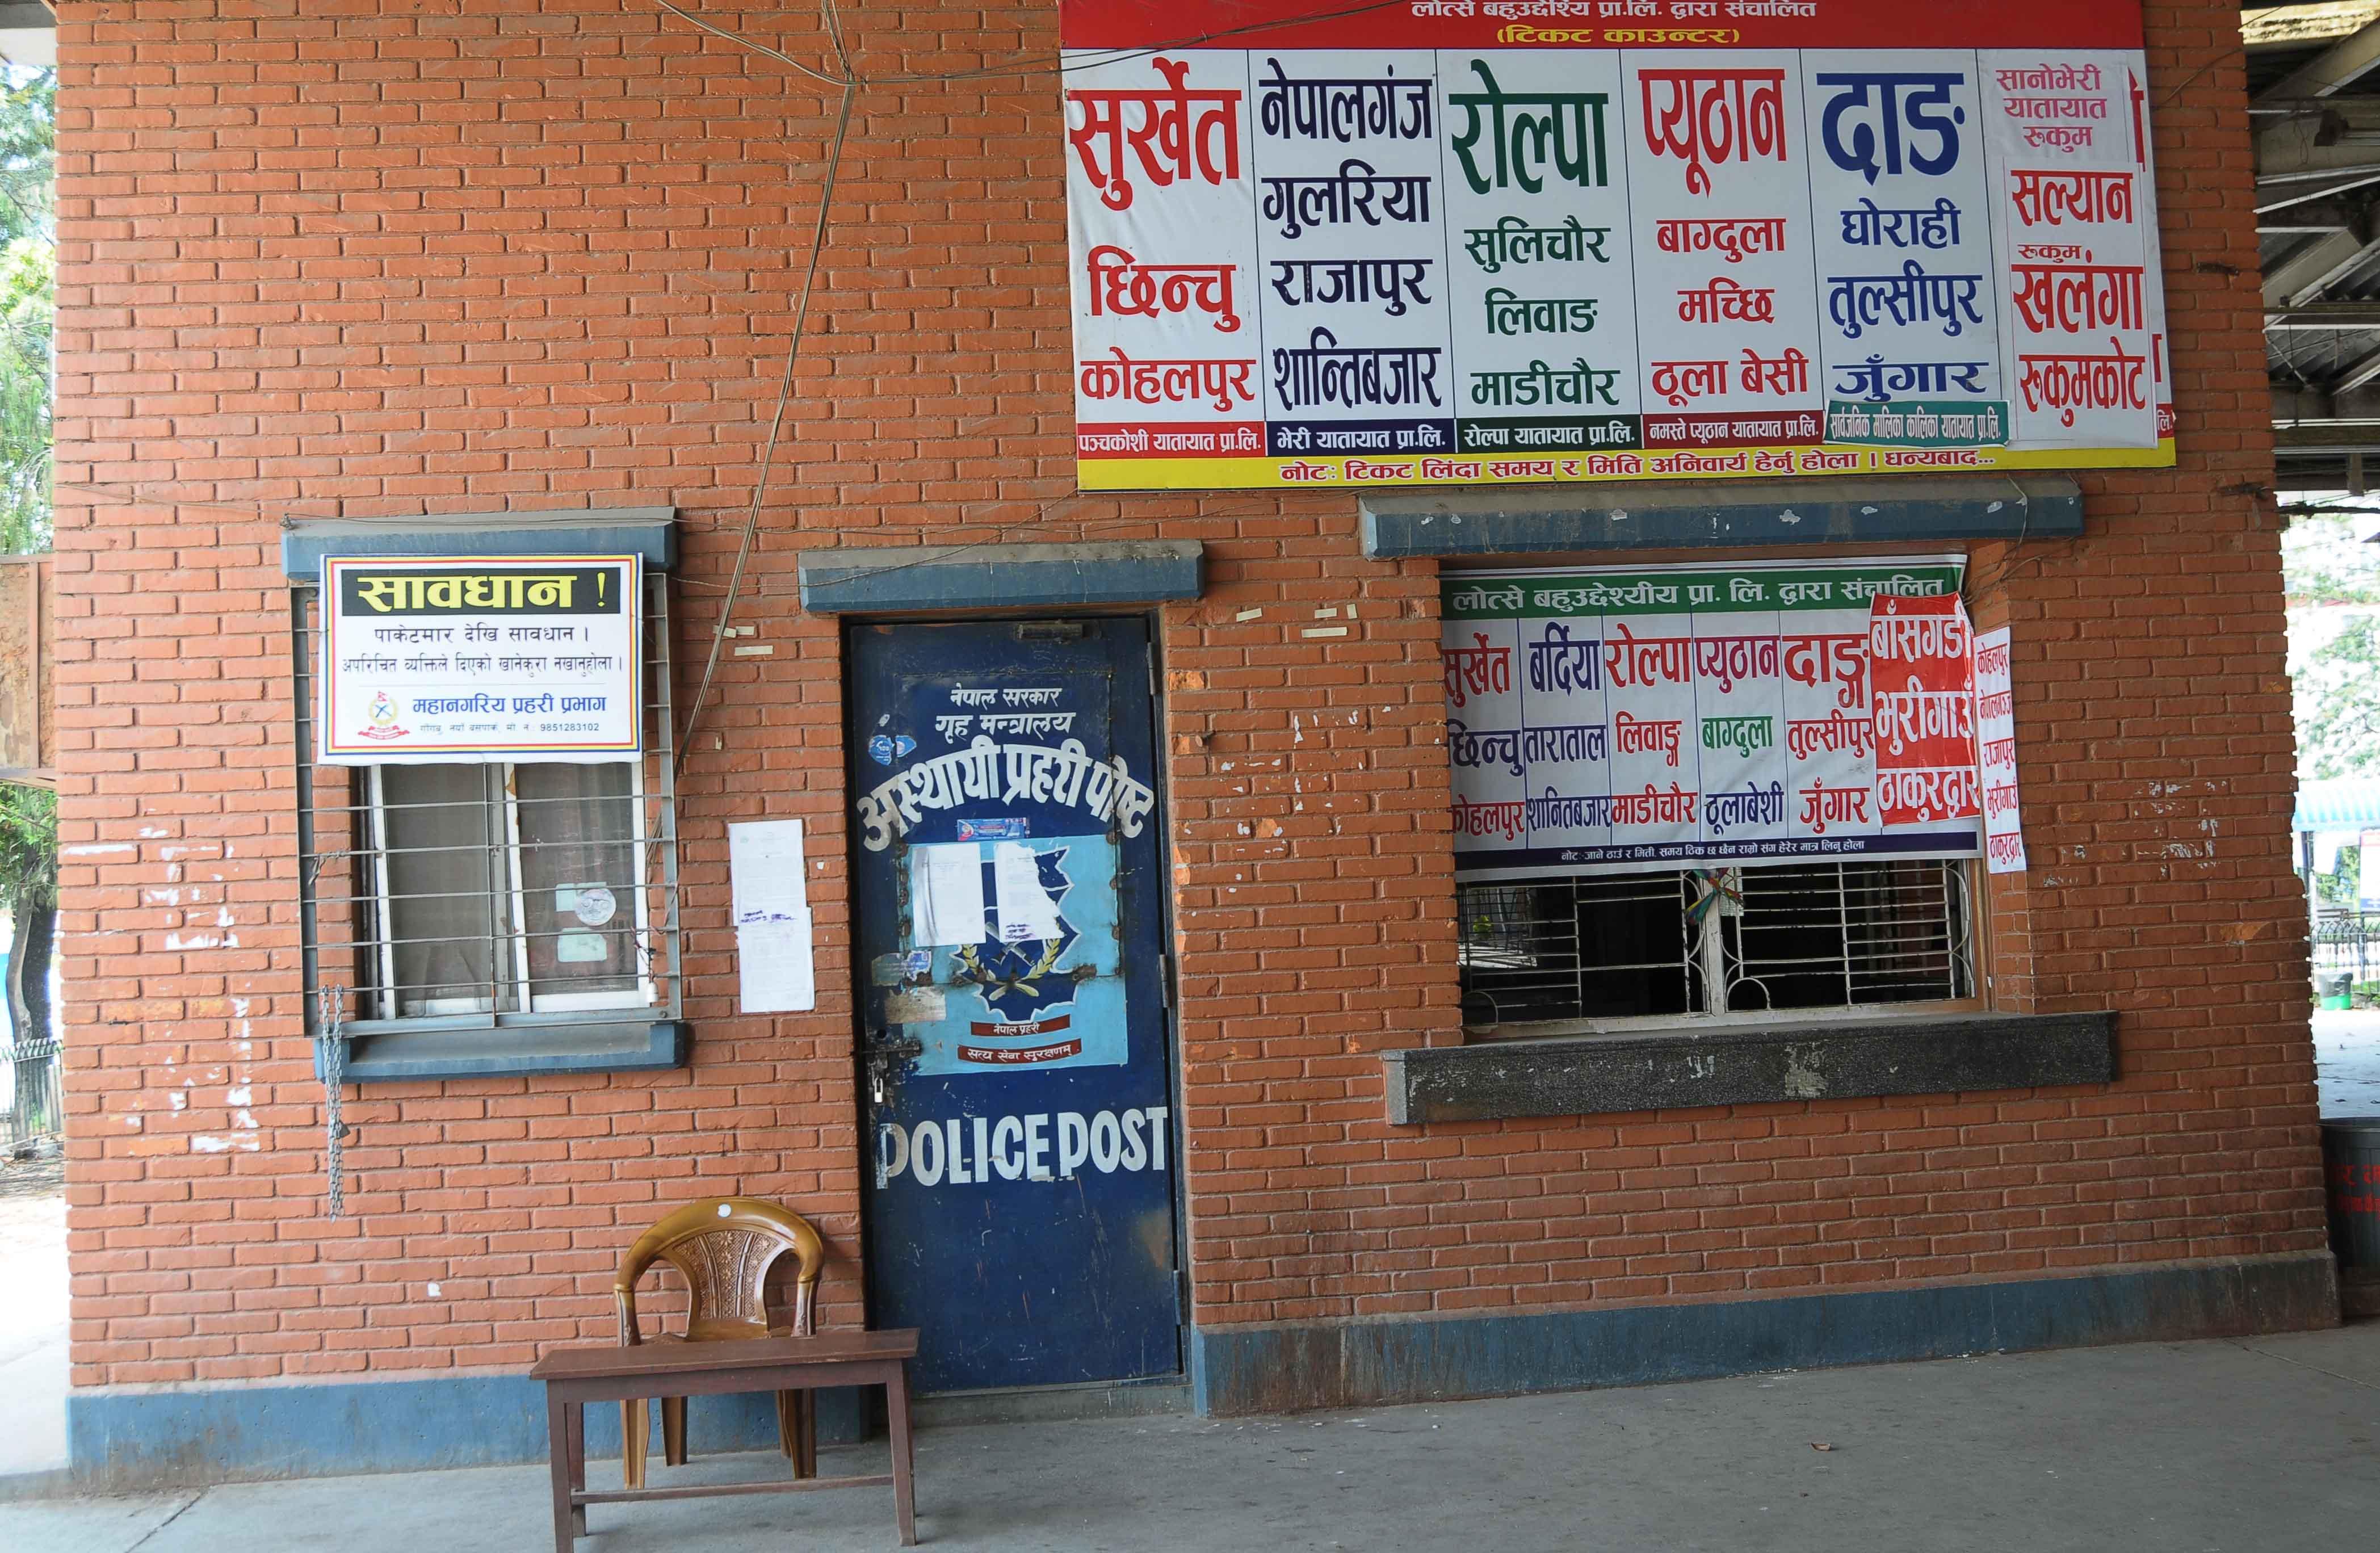 The ticket counter at Gongabu Buspark, as seen on Monday, June 1, 2020. Photo: Balkrishna Thapa Chettri/THT